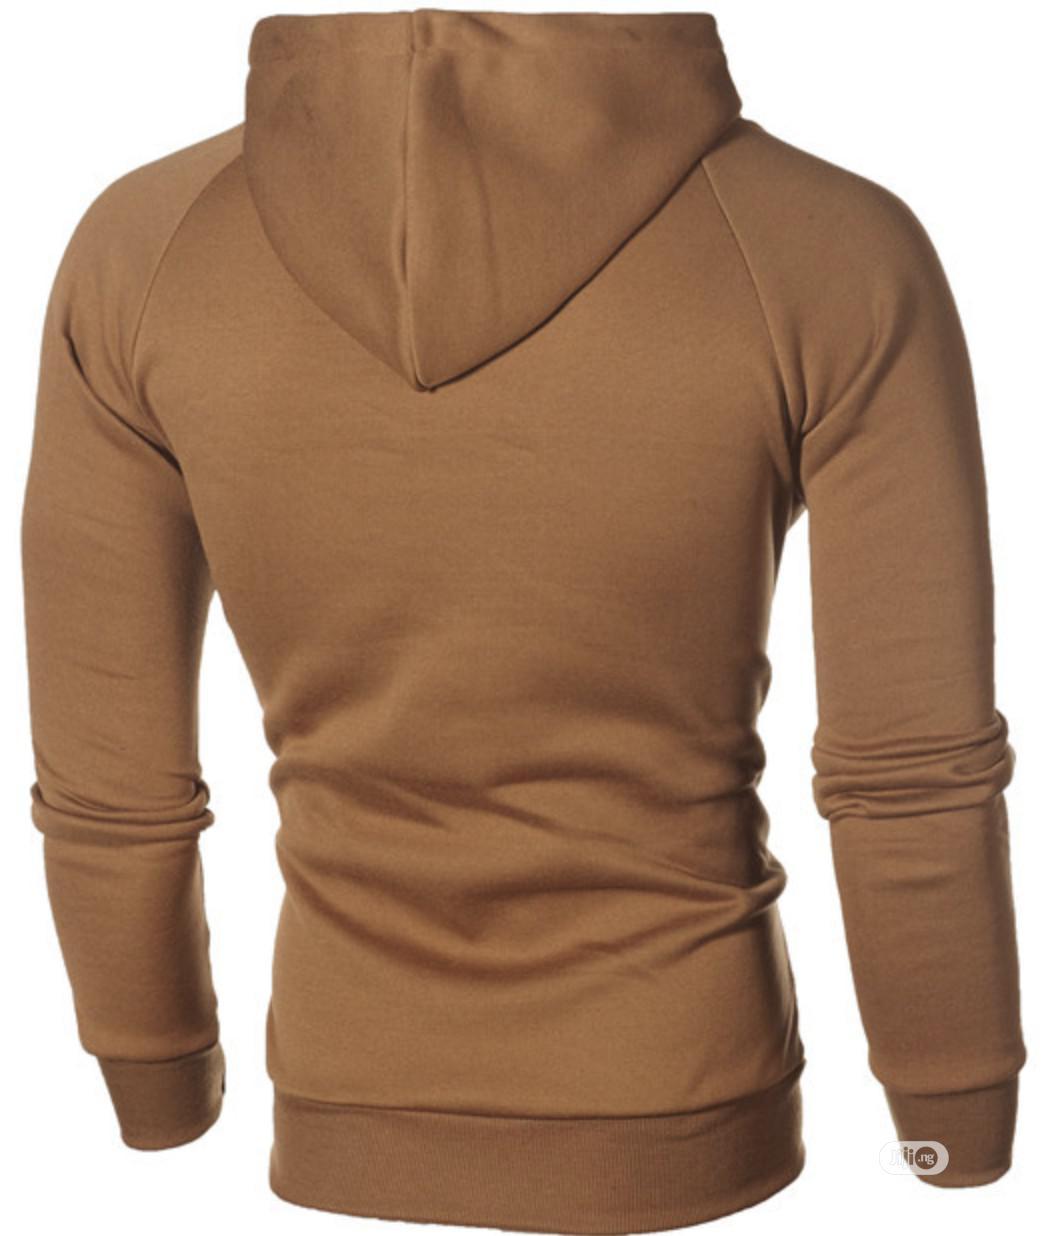 Knit Sweater Cardigan- Hoodies | Clothing for sale in Ibadan, Oyo State, Nigeria